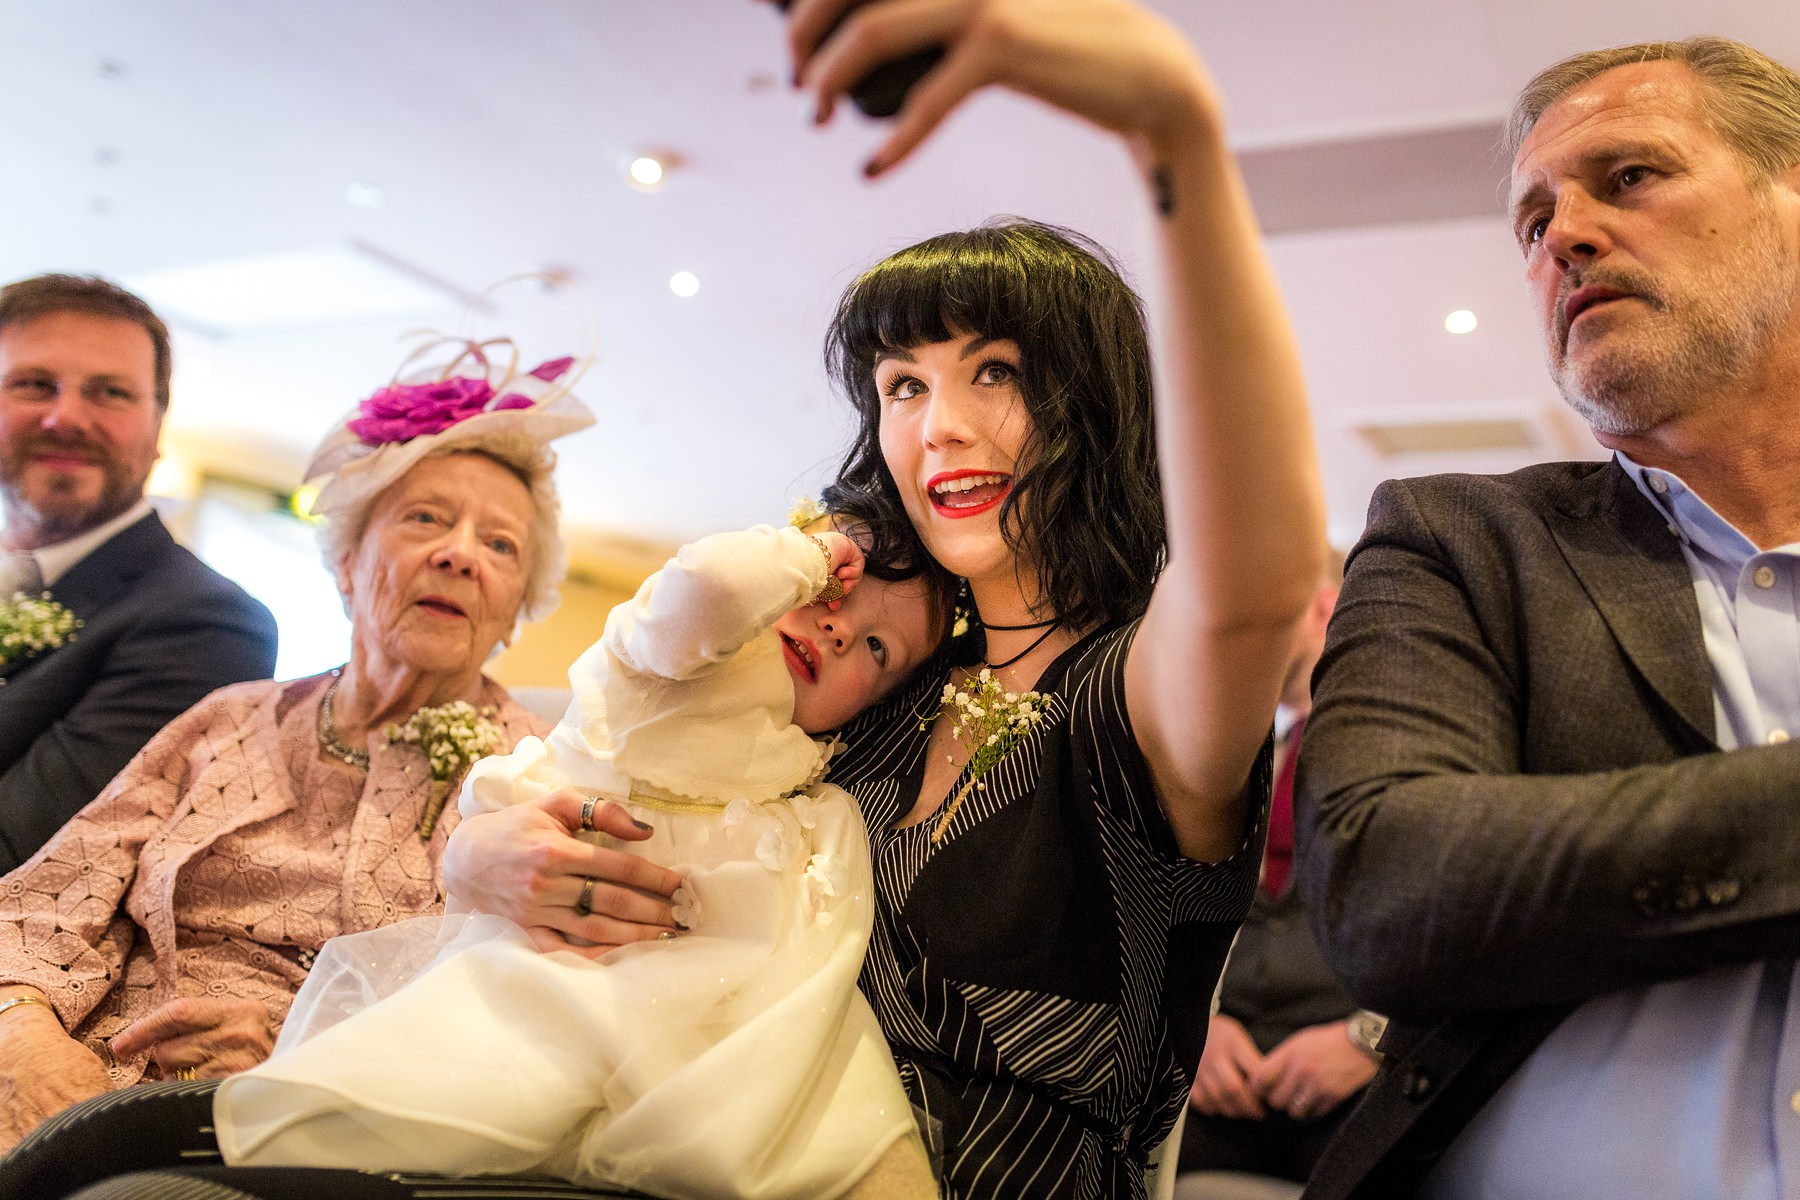 intimate-wedding-at-kilhey-court-lancashire-photographer_0013.jpg